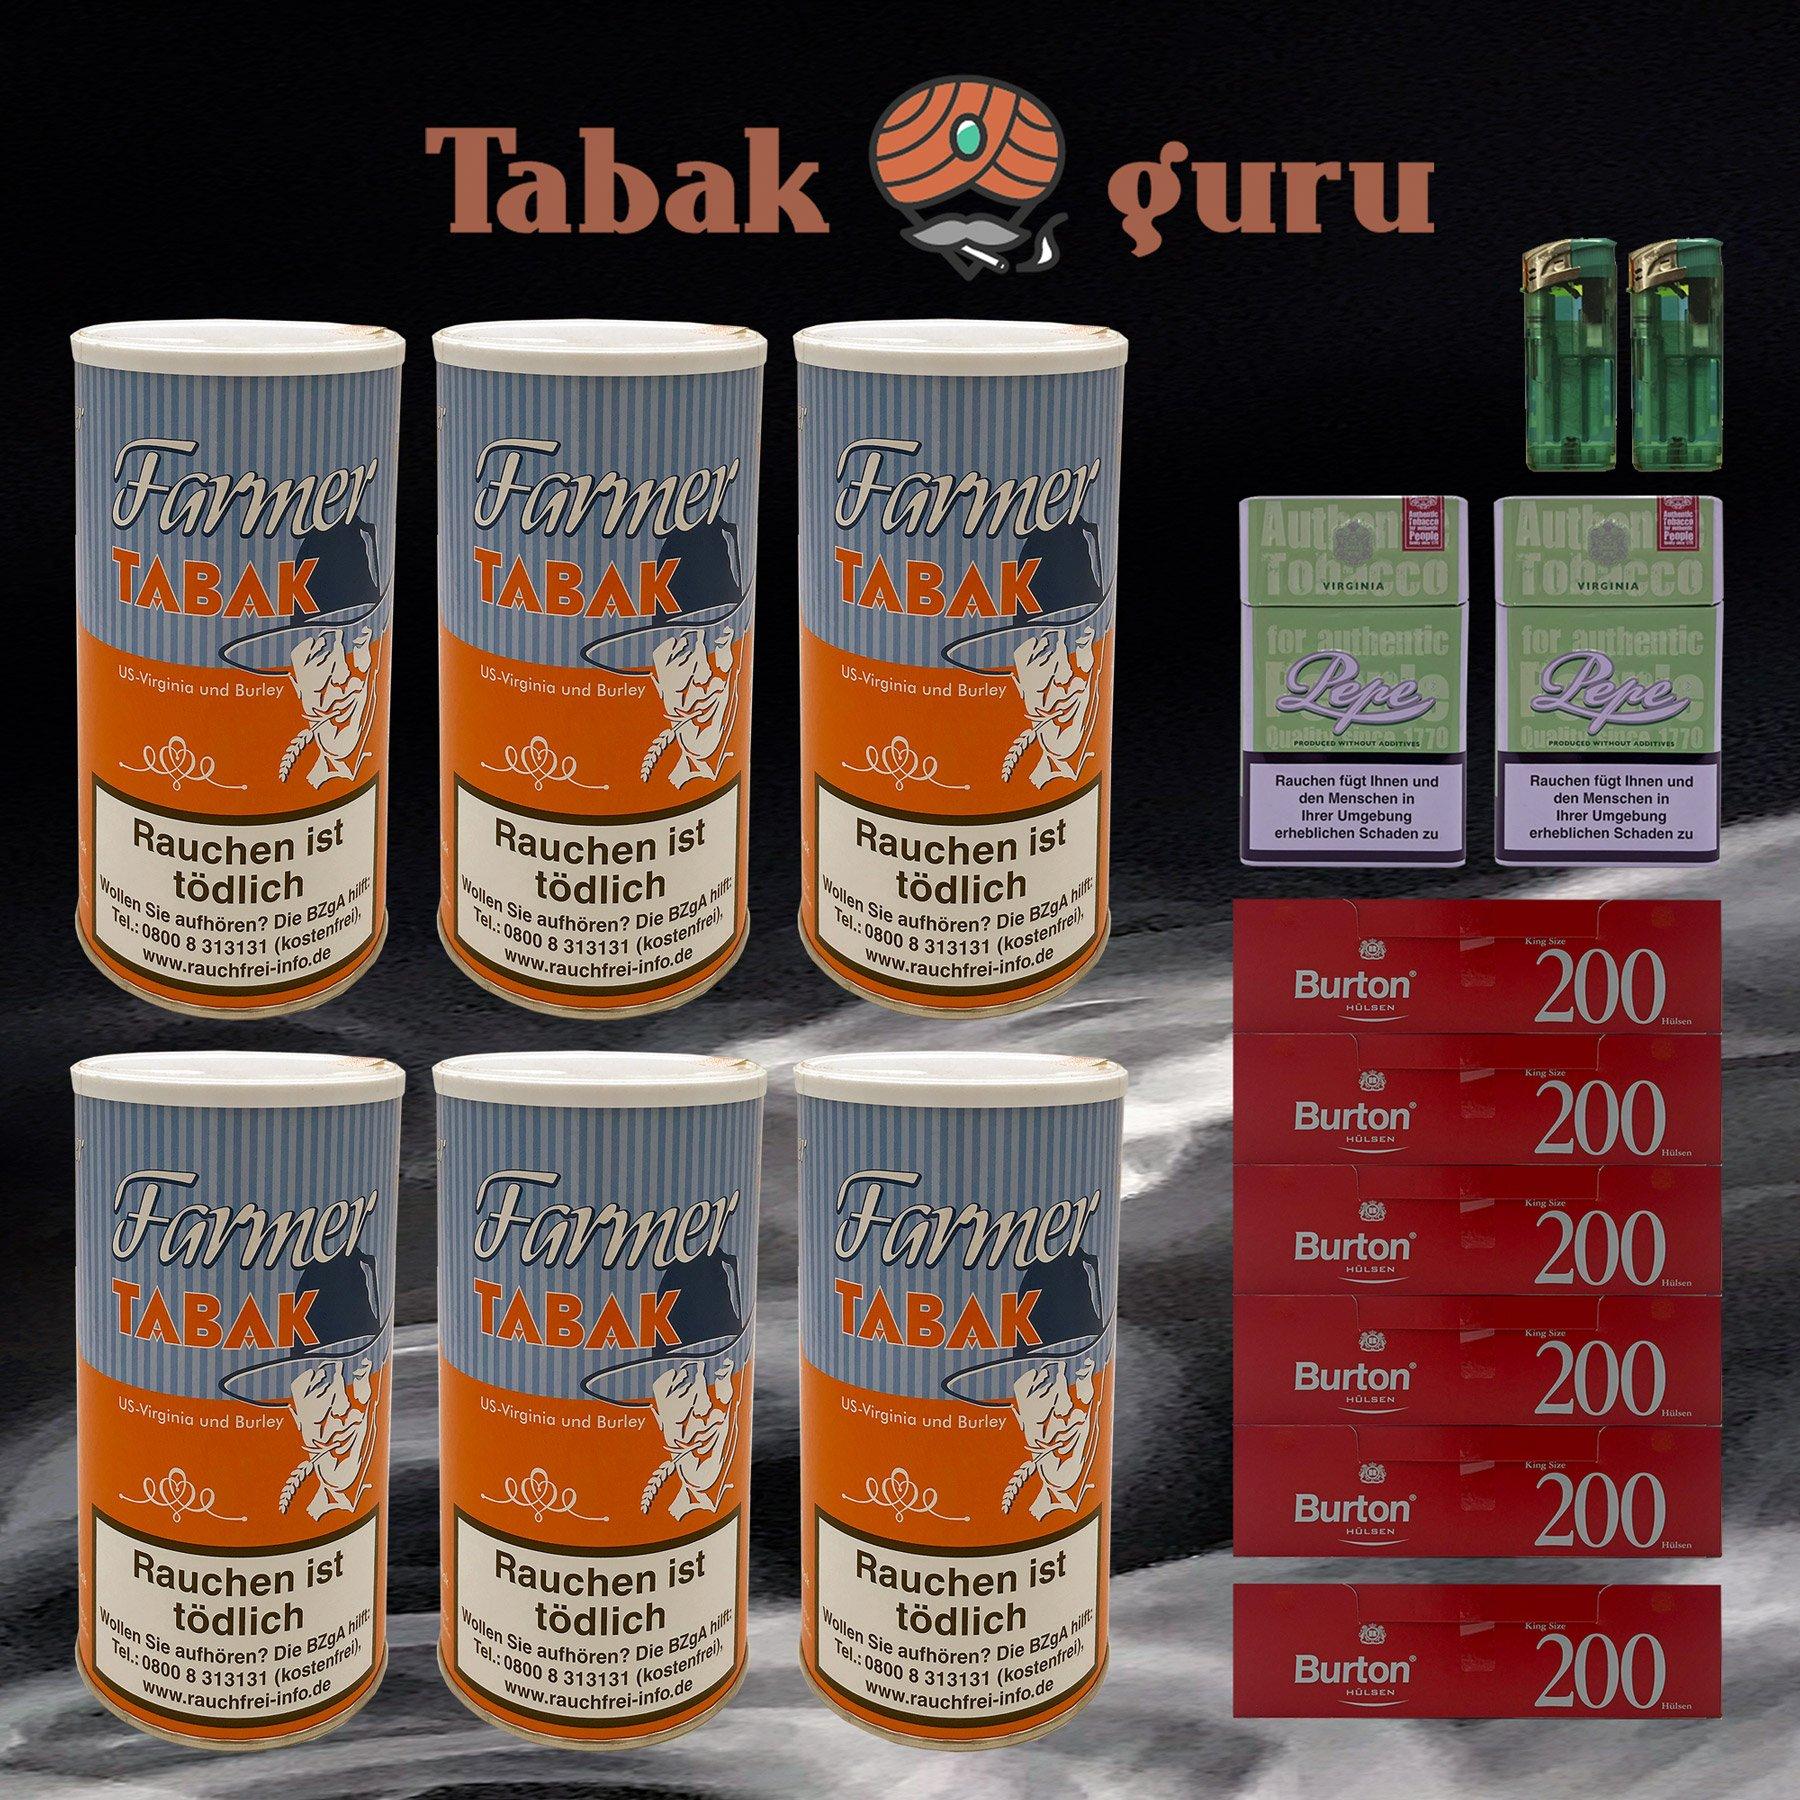 6x Farmer Tabak Dosen/ Pfeifentabak à 170g + 1.200 Burton Hülsen, Zubehör